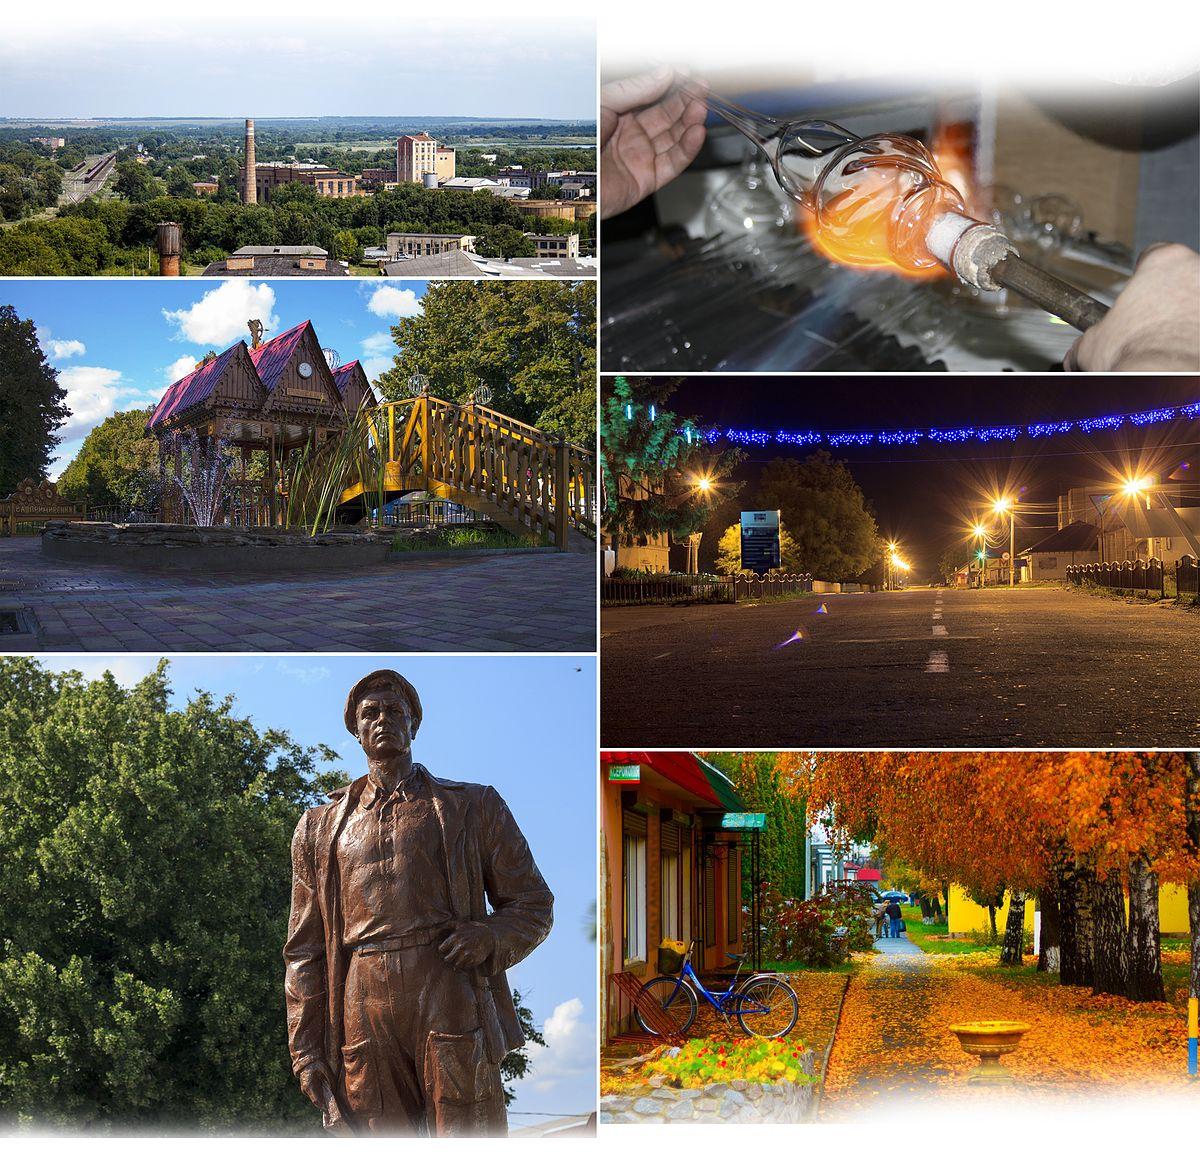 Chervonozavodskoe: a selection of sites